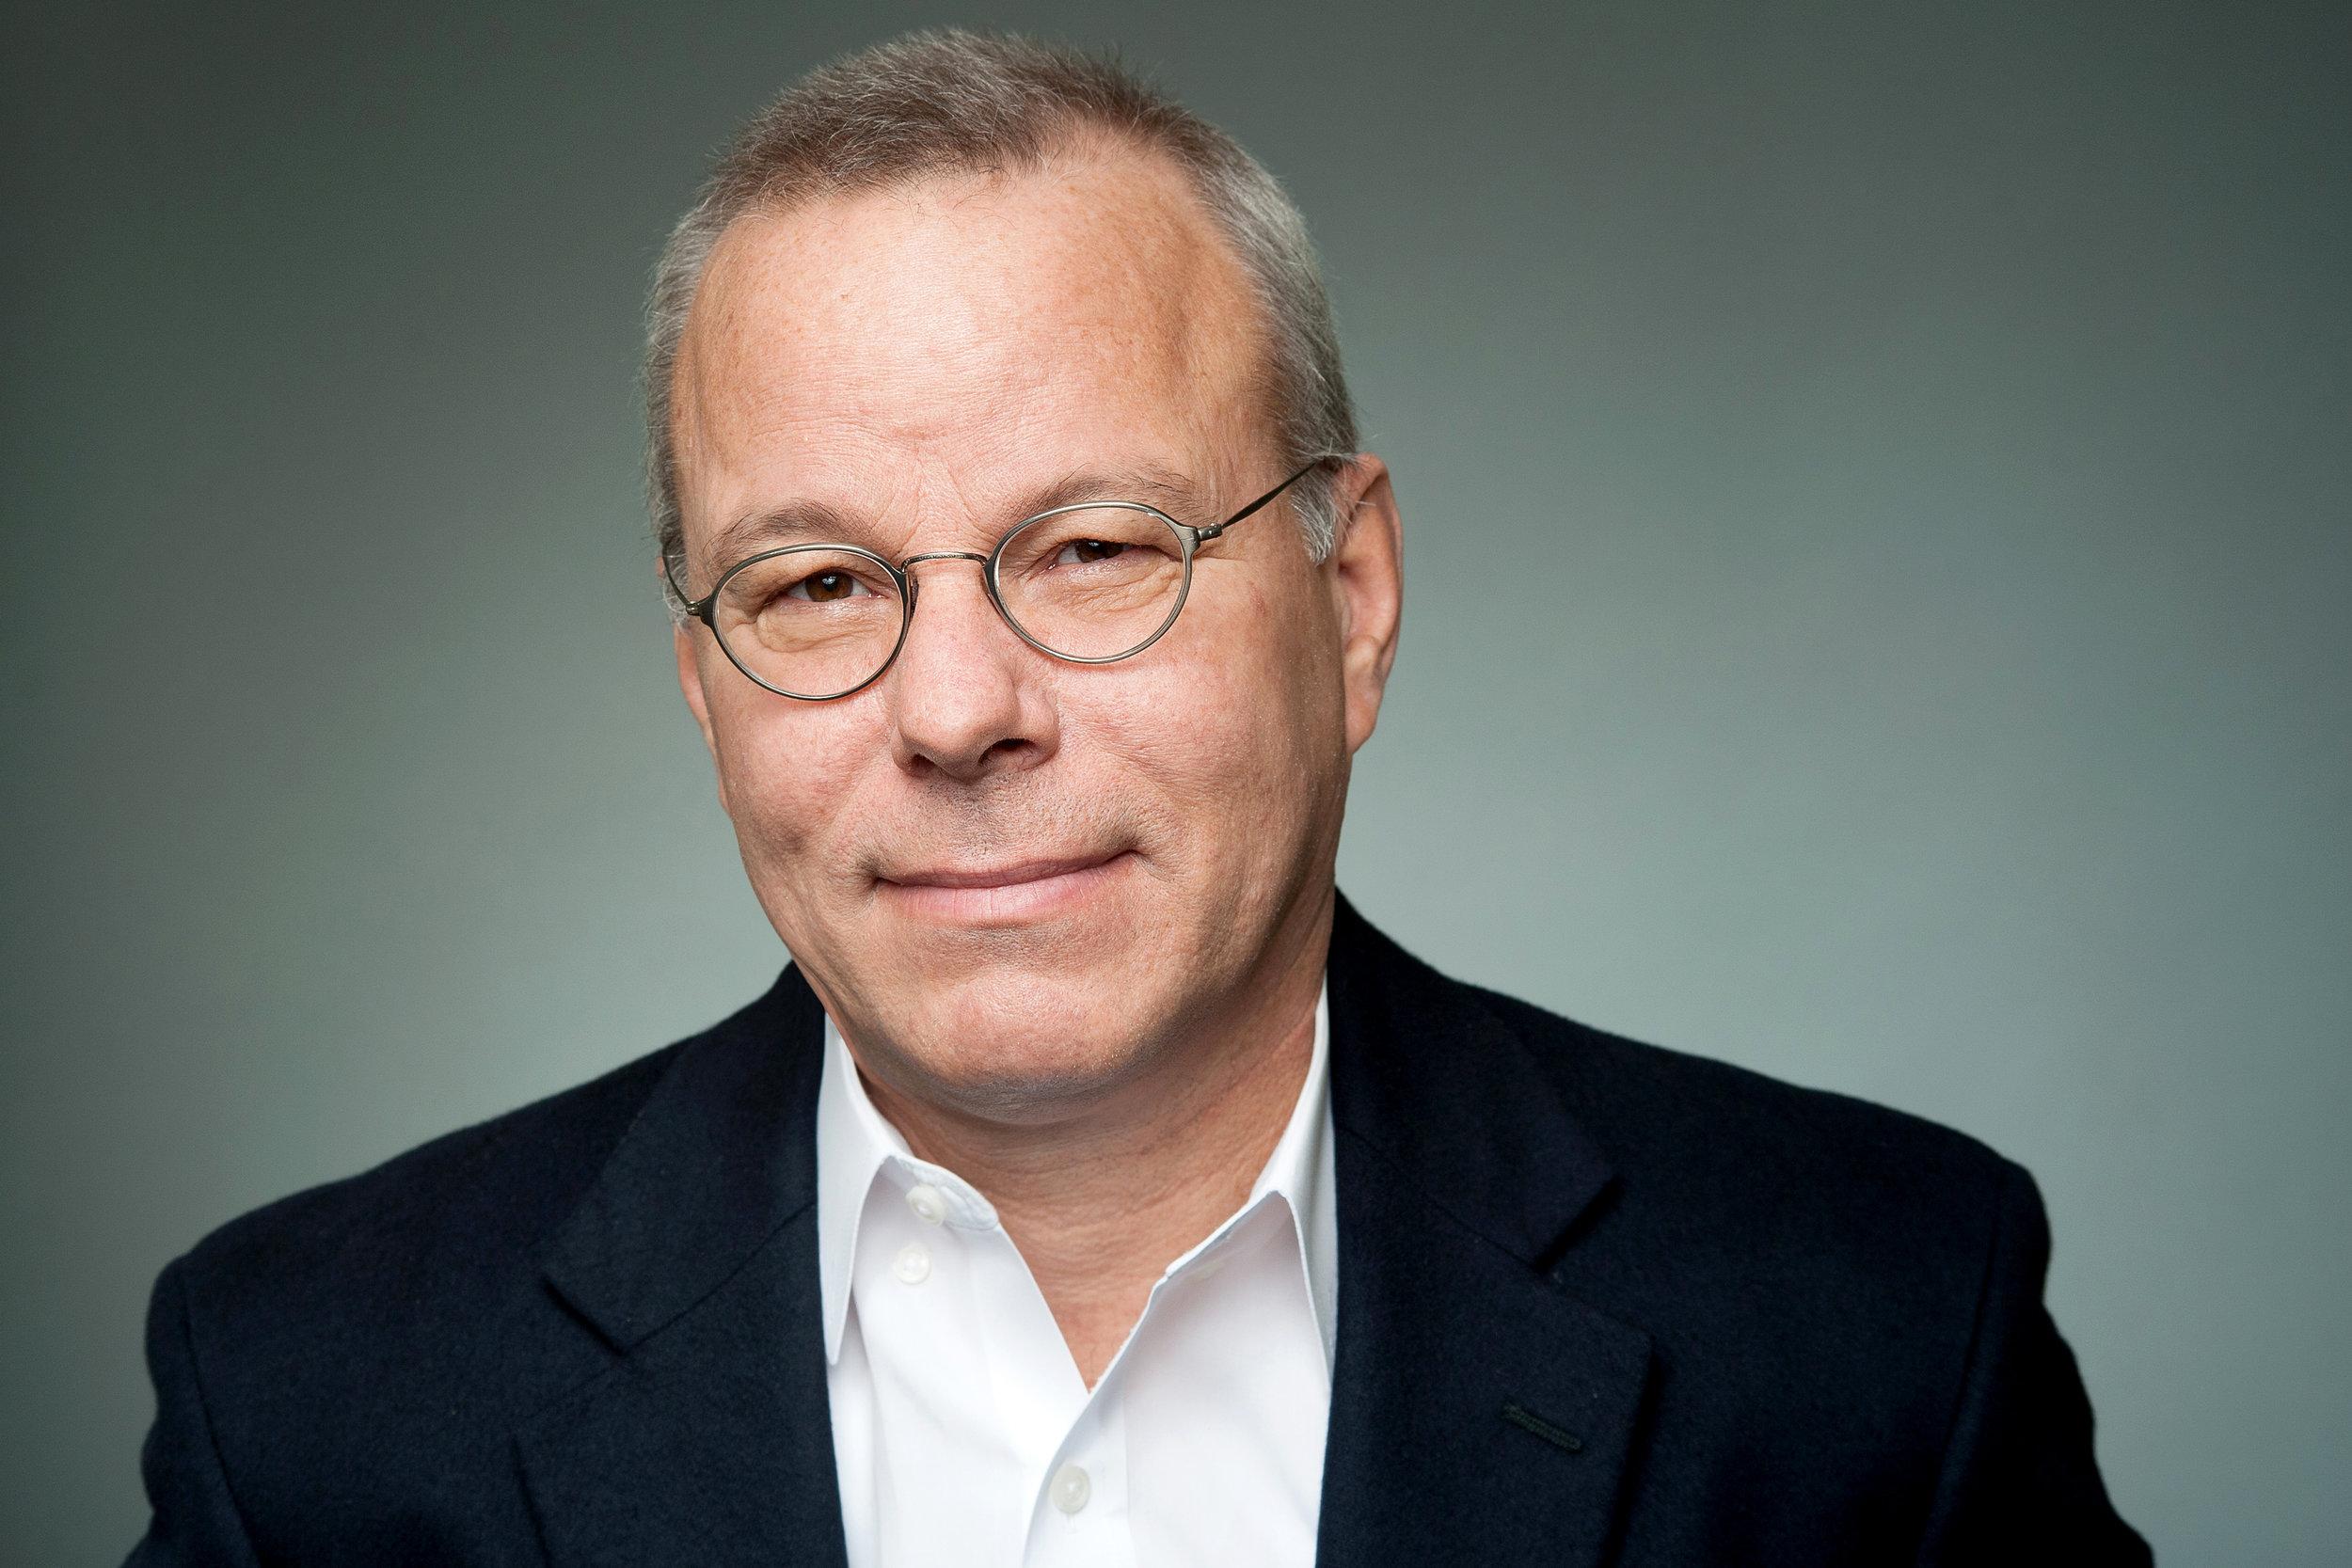 Robert Chamberlain - Chairman & Chief Executive Officer